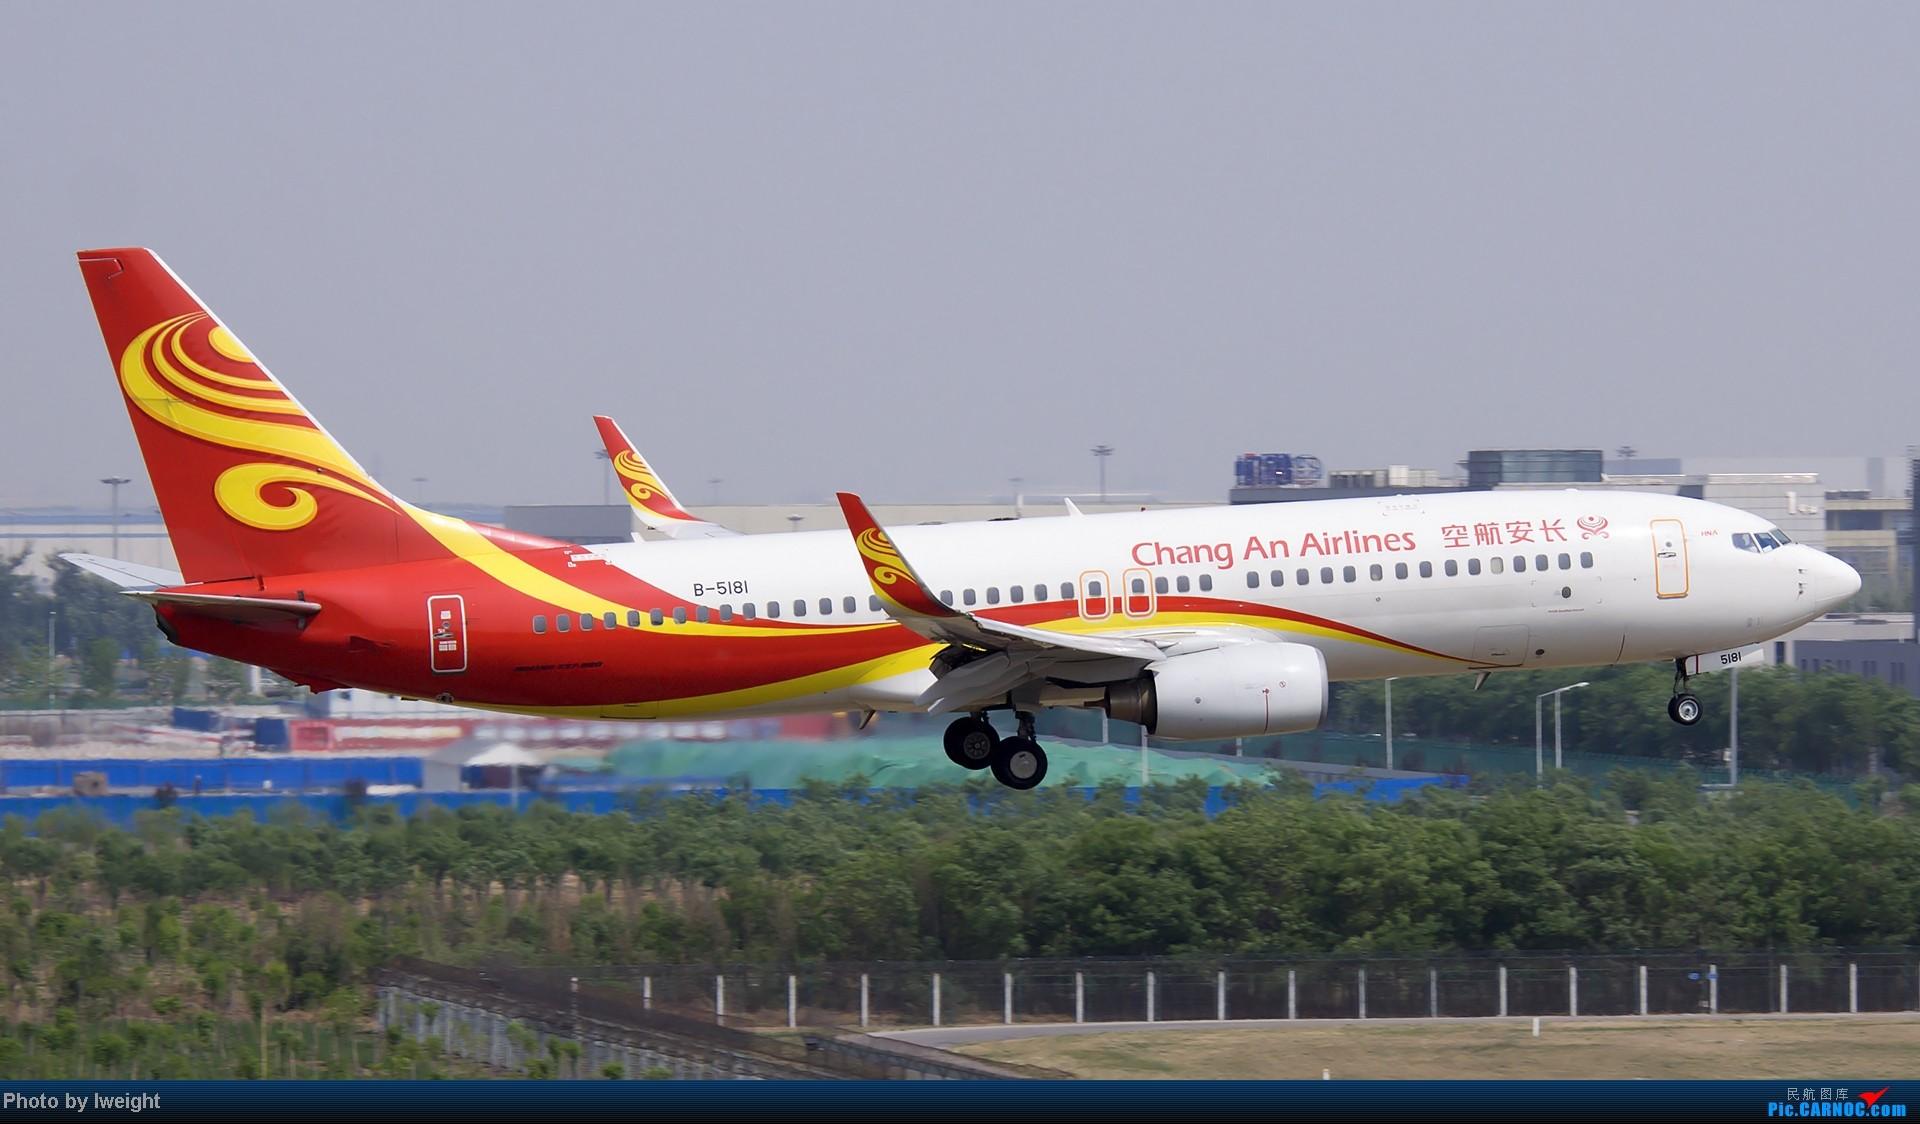 Re:[原创]错过了卡航的巴塞罗那号,只有这些大路货了,泪奔啊 BOEING 737-800 B-5181 中国北京首都机场